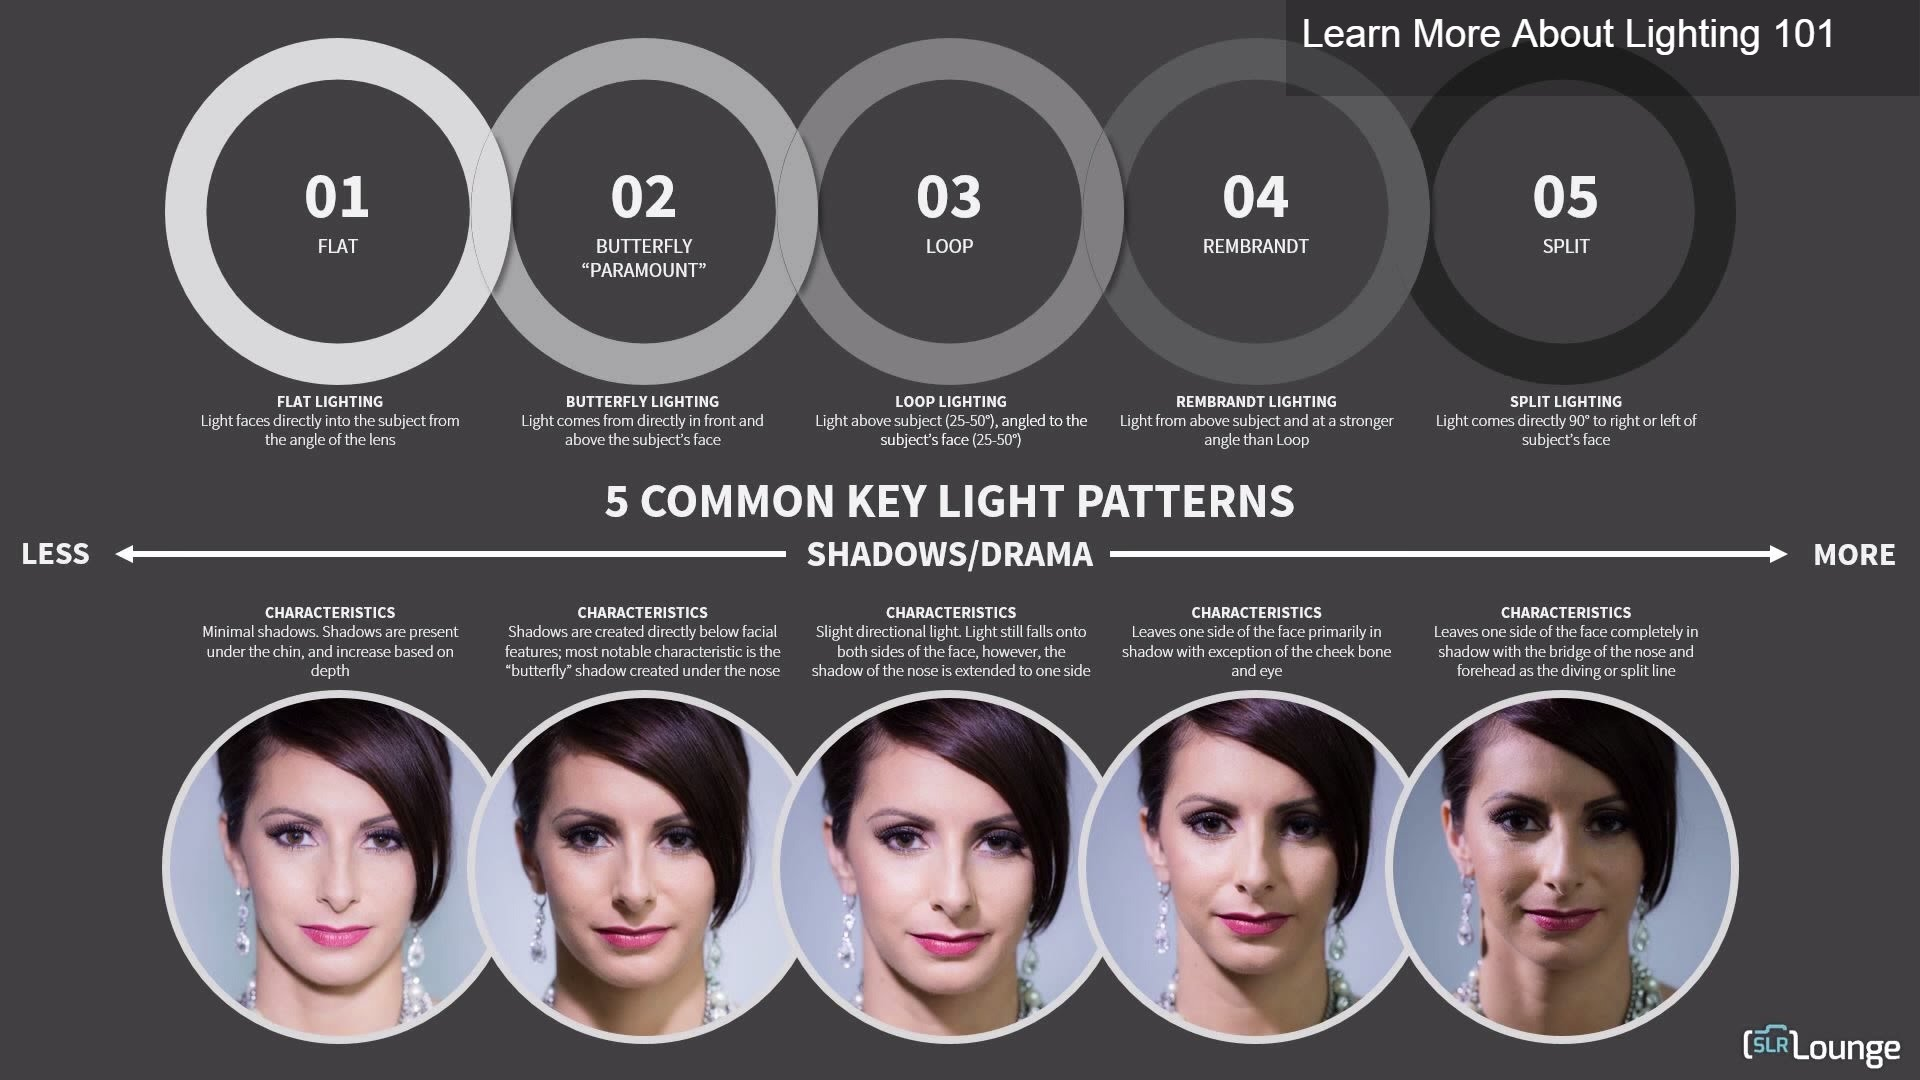 rembrandt lighting diagram nissan 1400 distributor wiring basic light patterns wpw photography burns